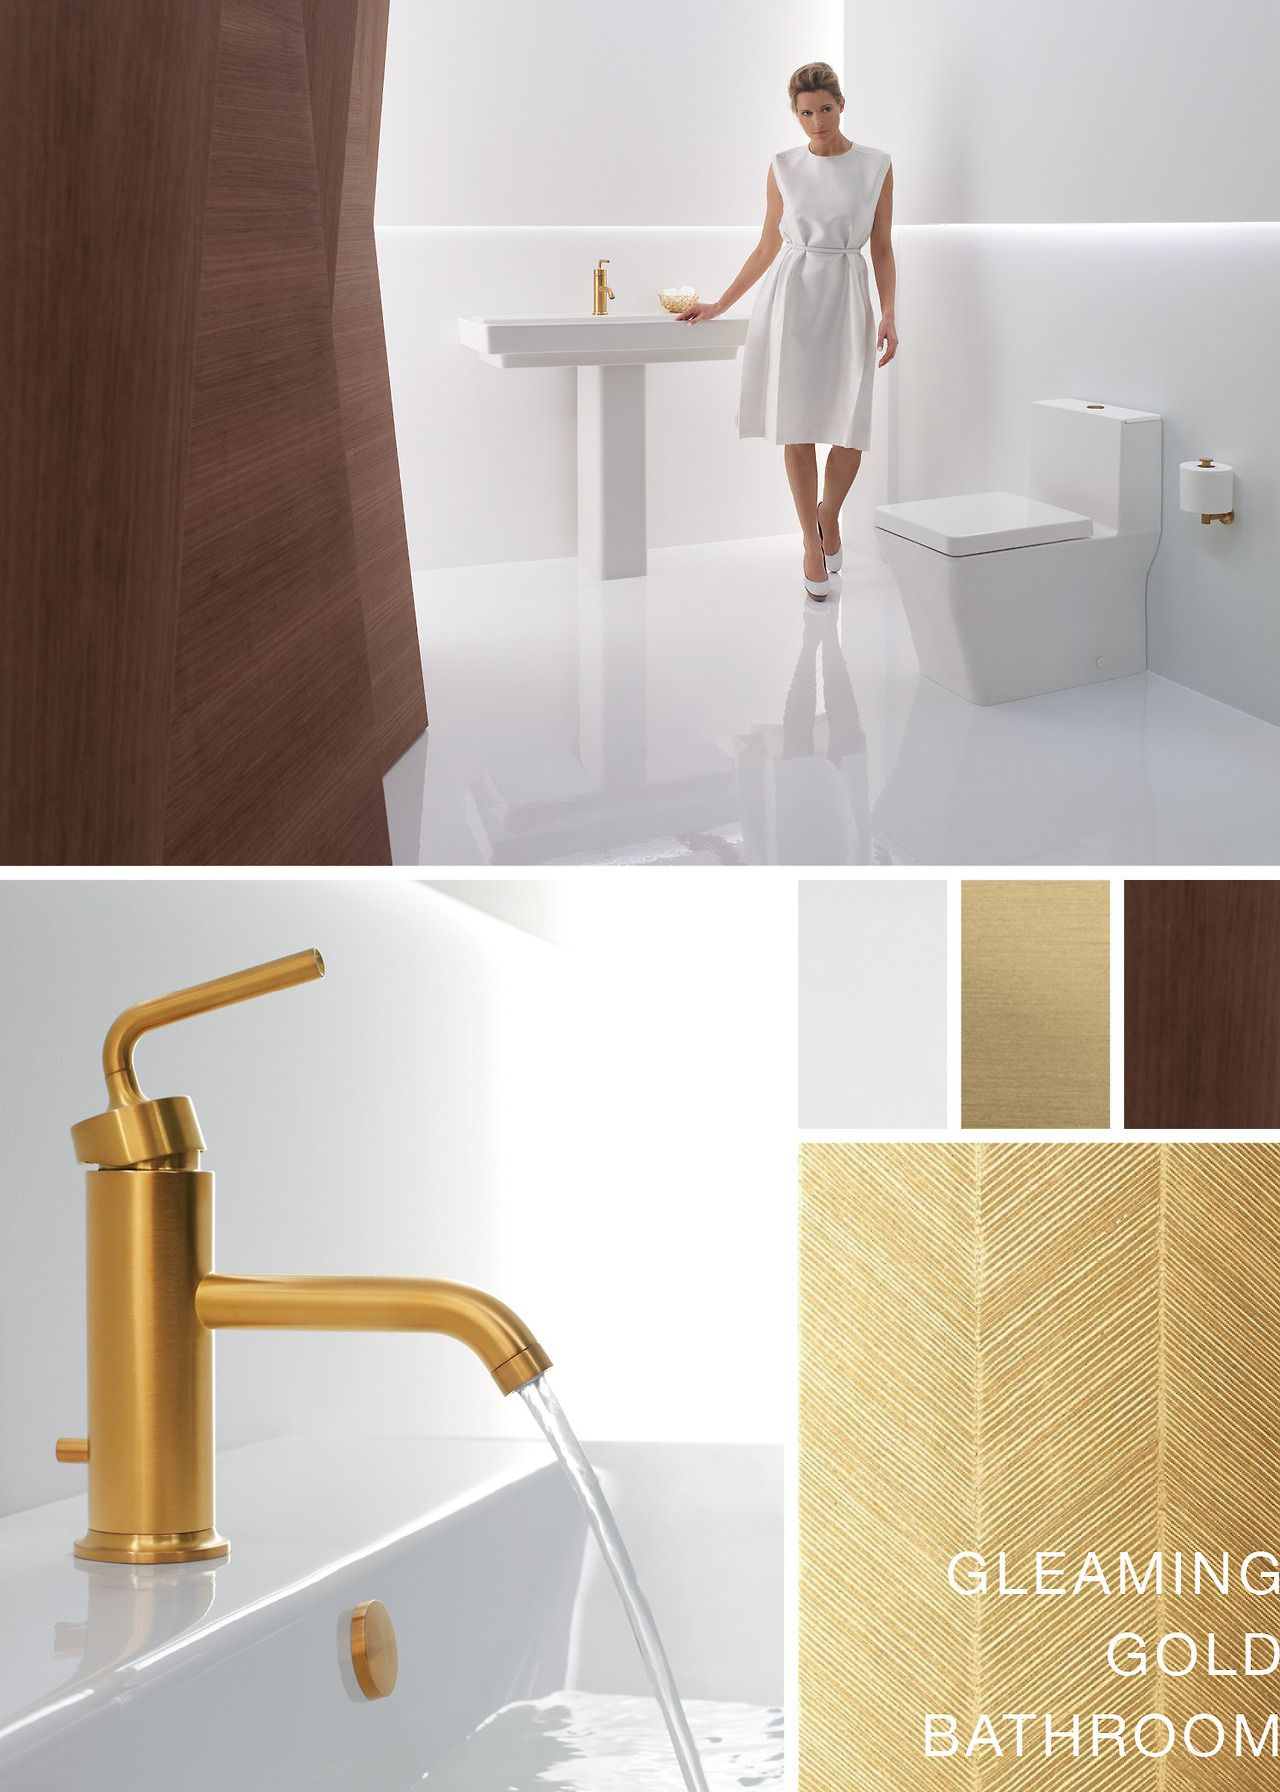 Gleaming Gold Bathroom Inspiration http://bold.kohler.com/tagged ...